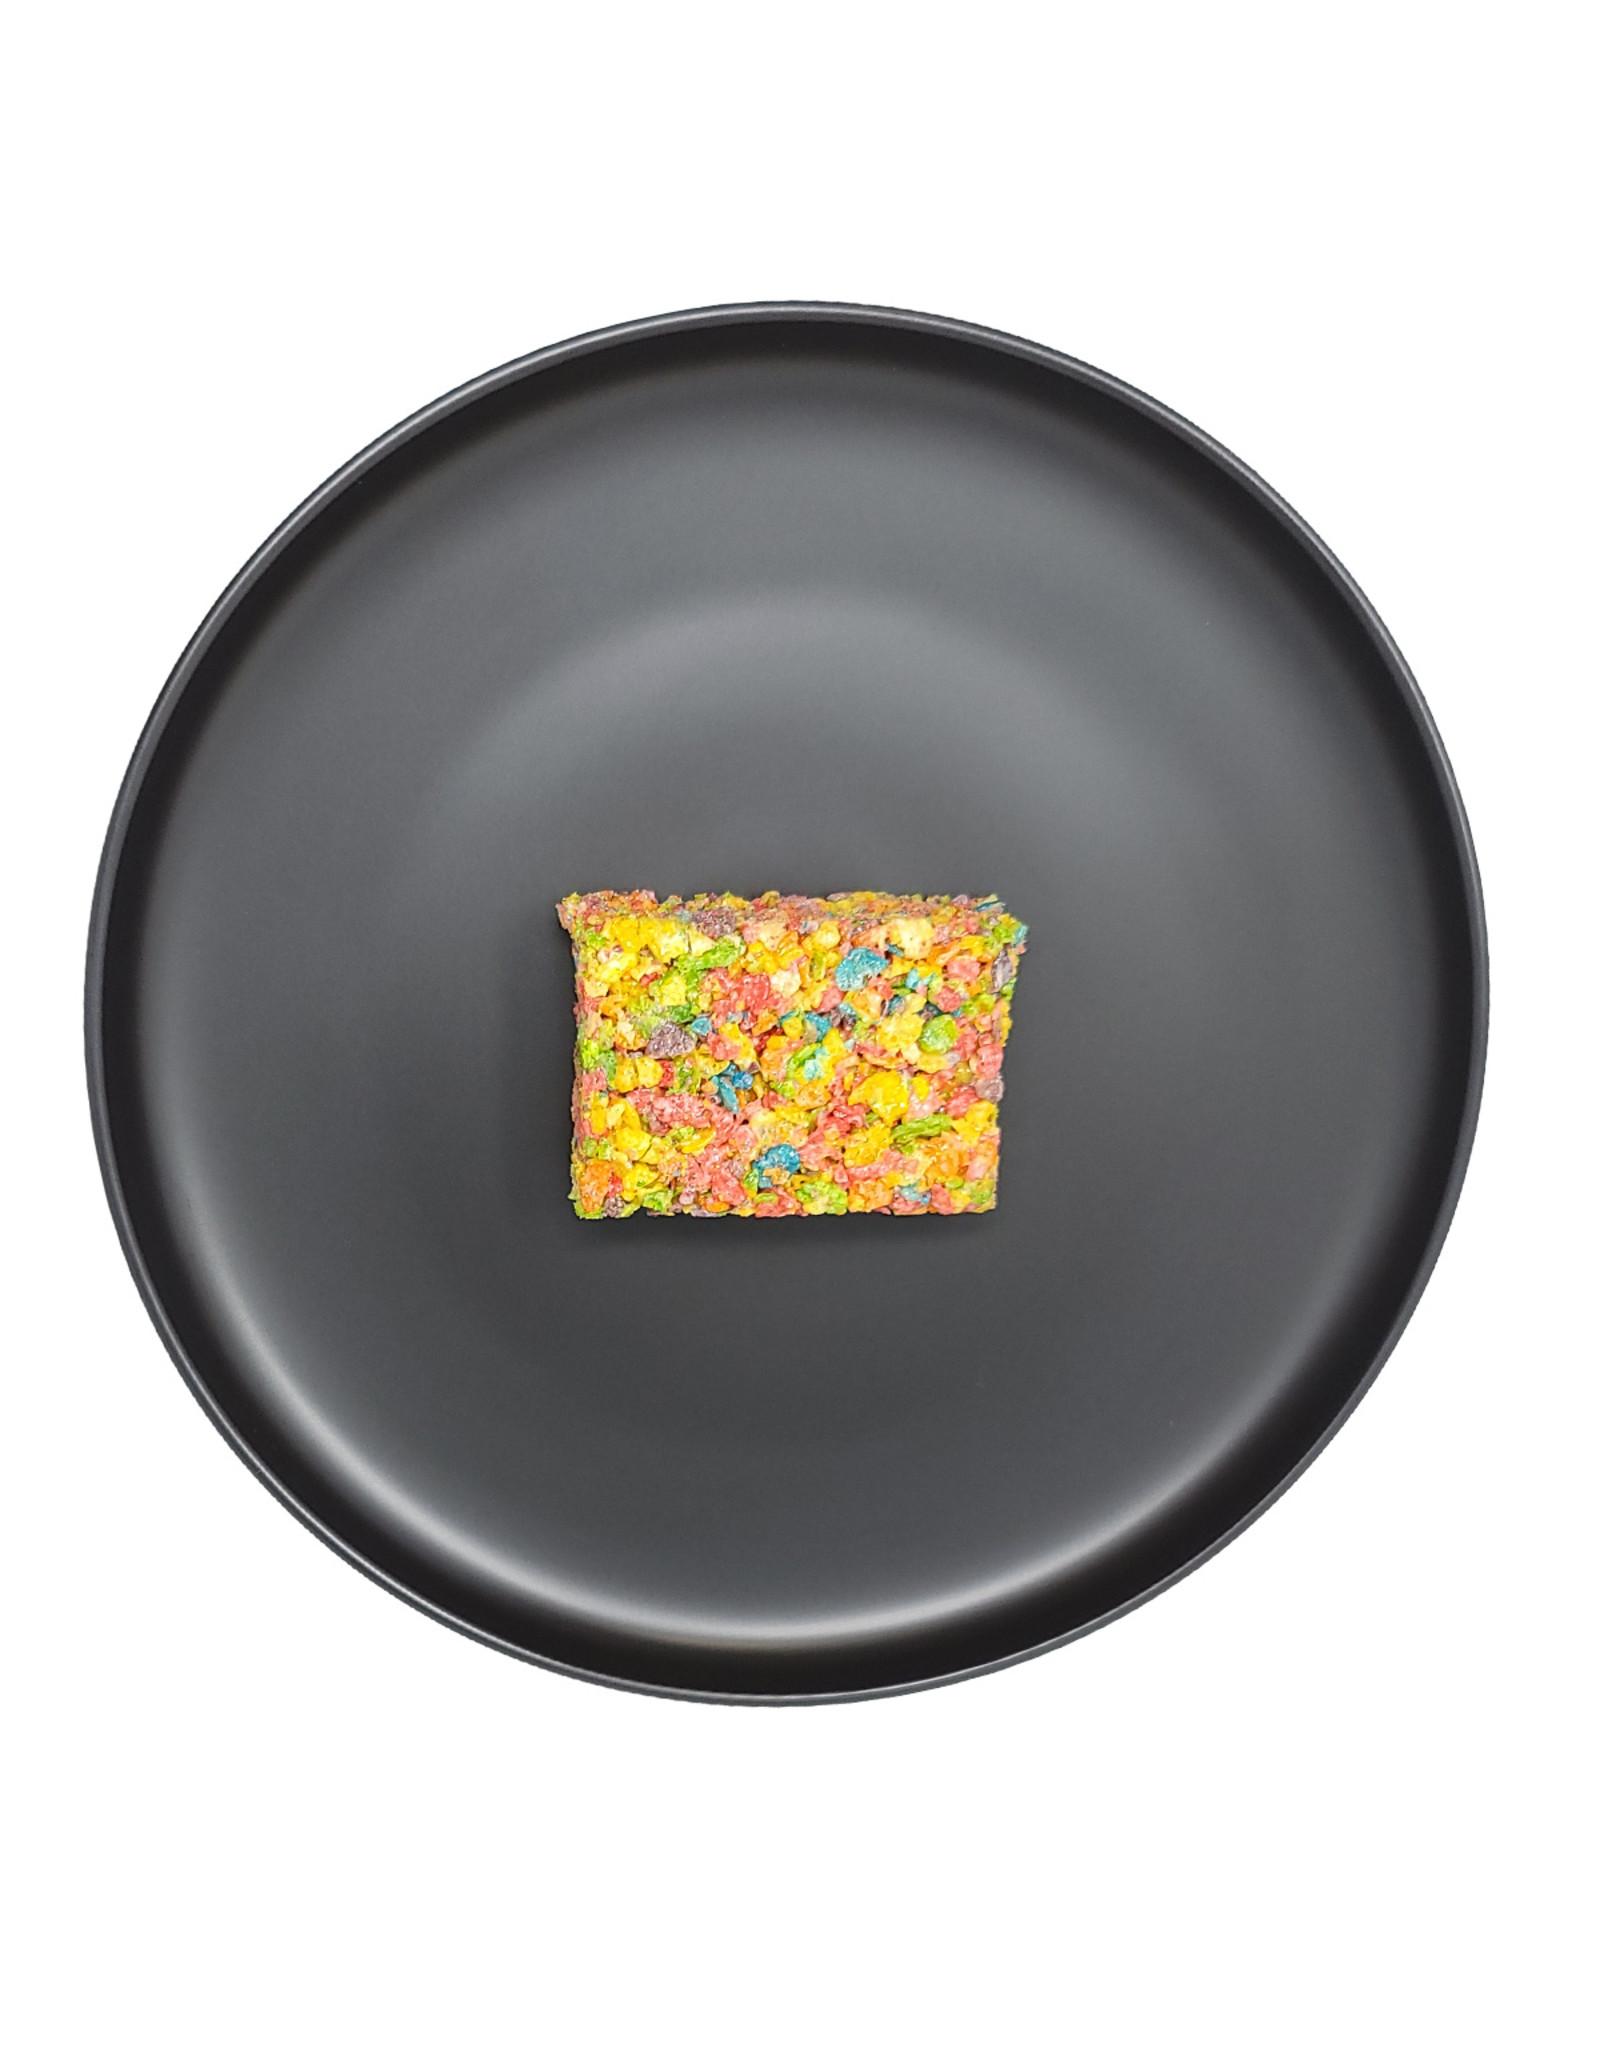 Snapdragon fruity pebbles treat